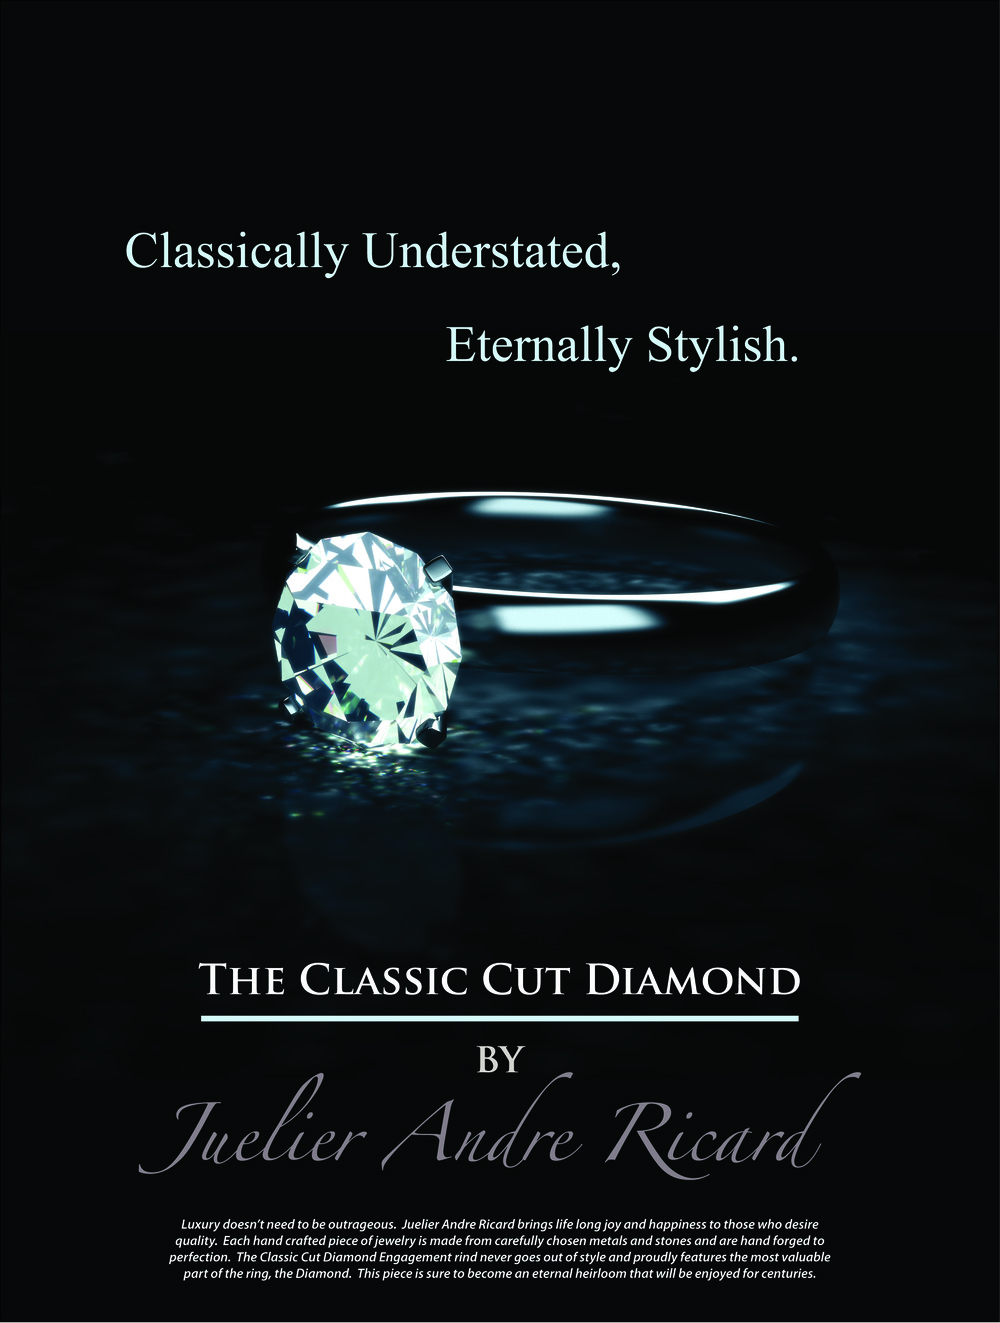 Classic+Cut+Ring+Back+Page.jpg